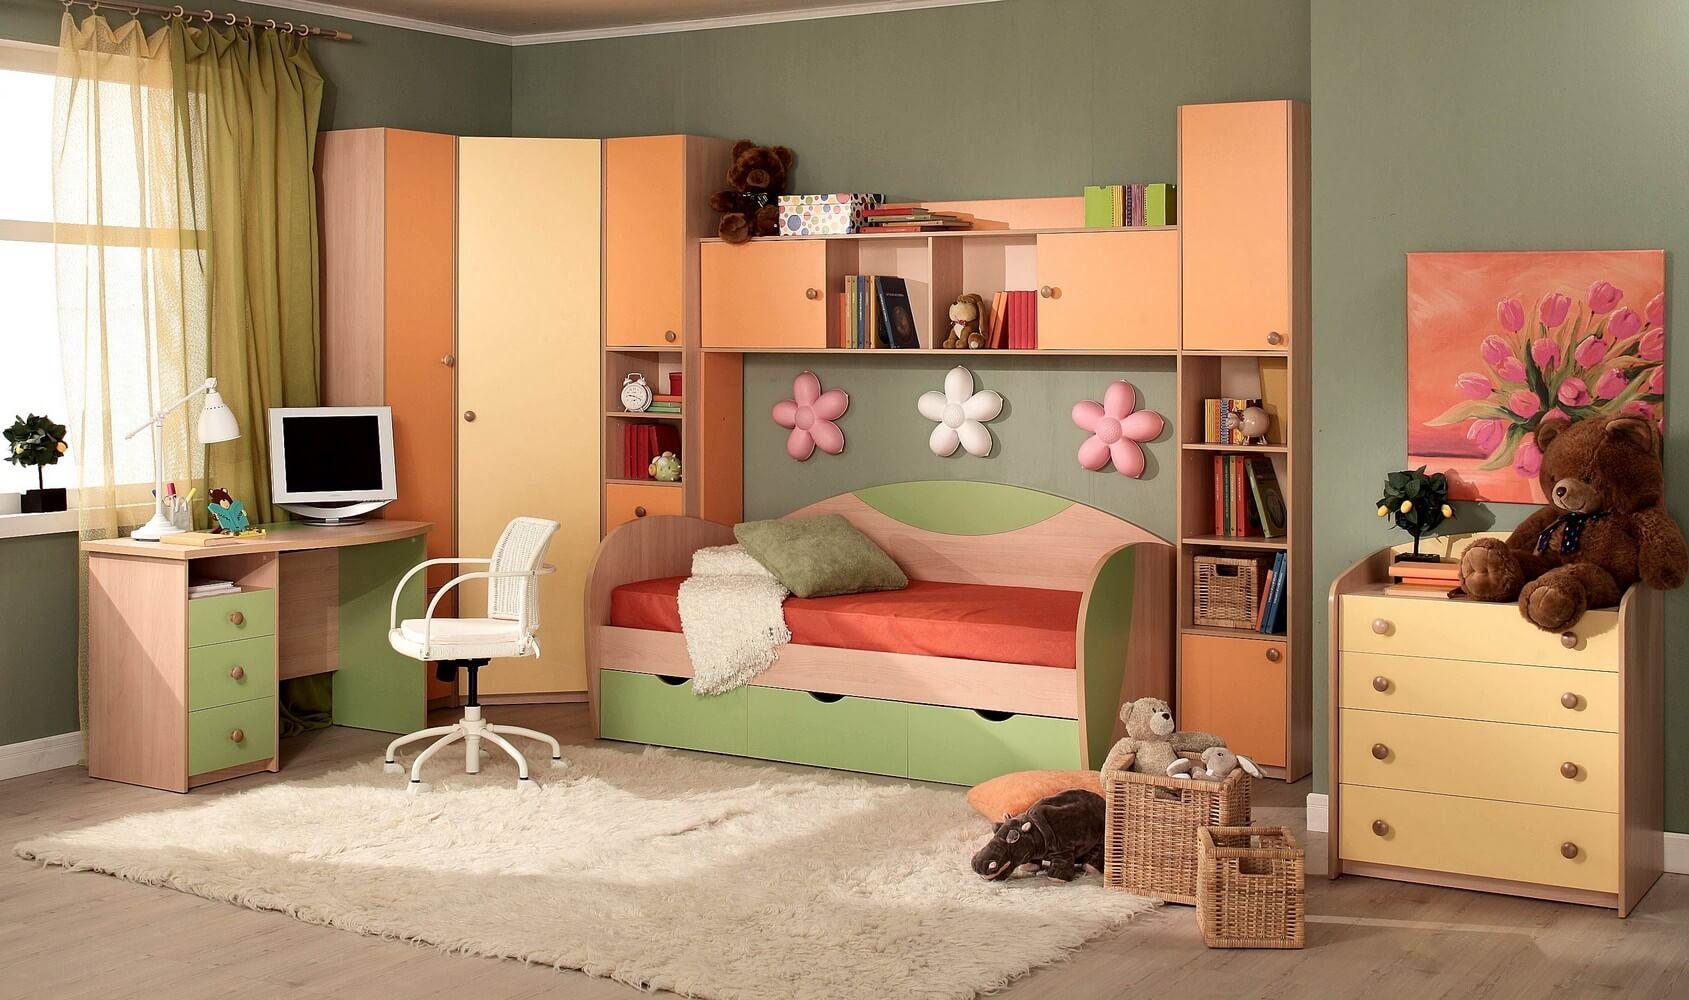 На фото: интерьер детской комнаты